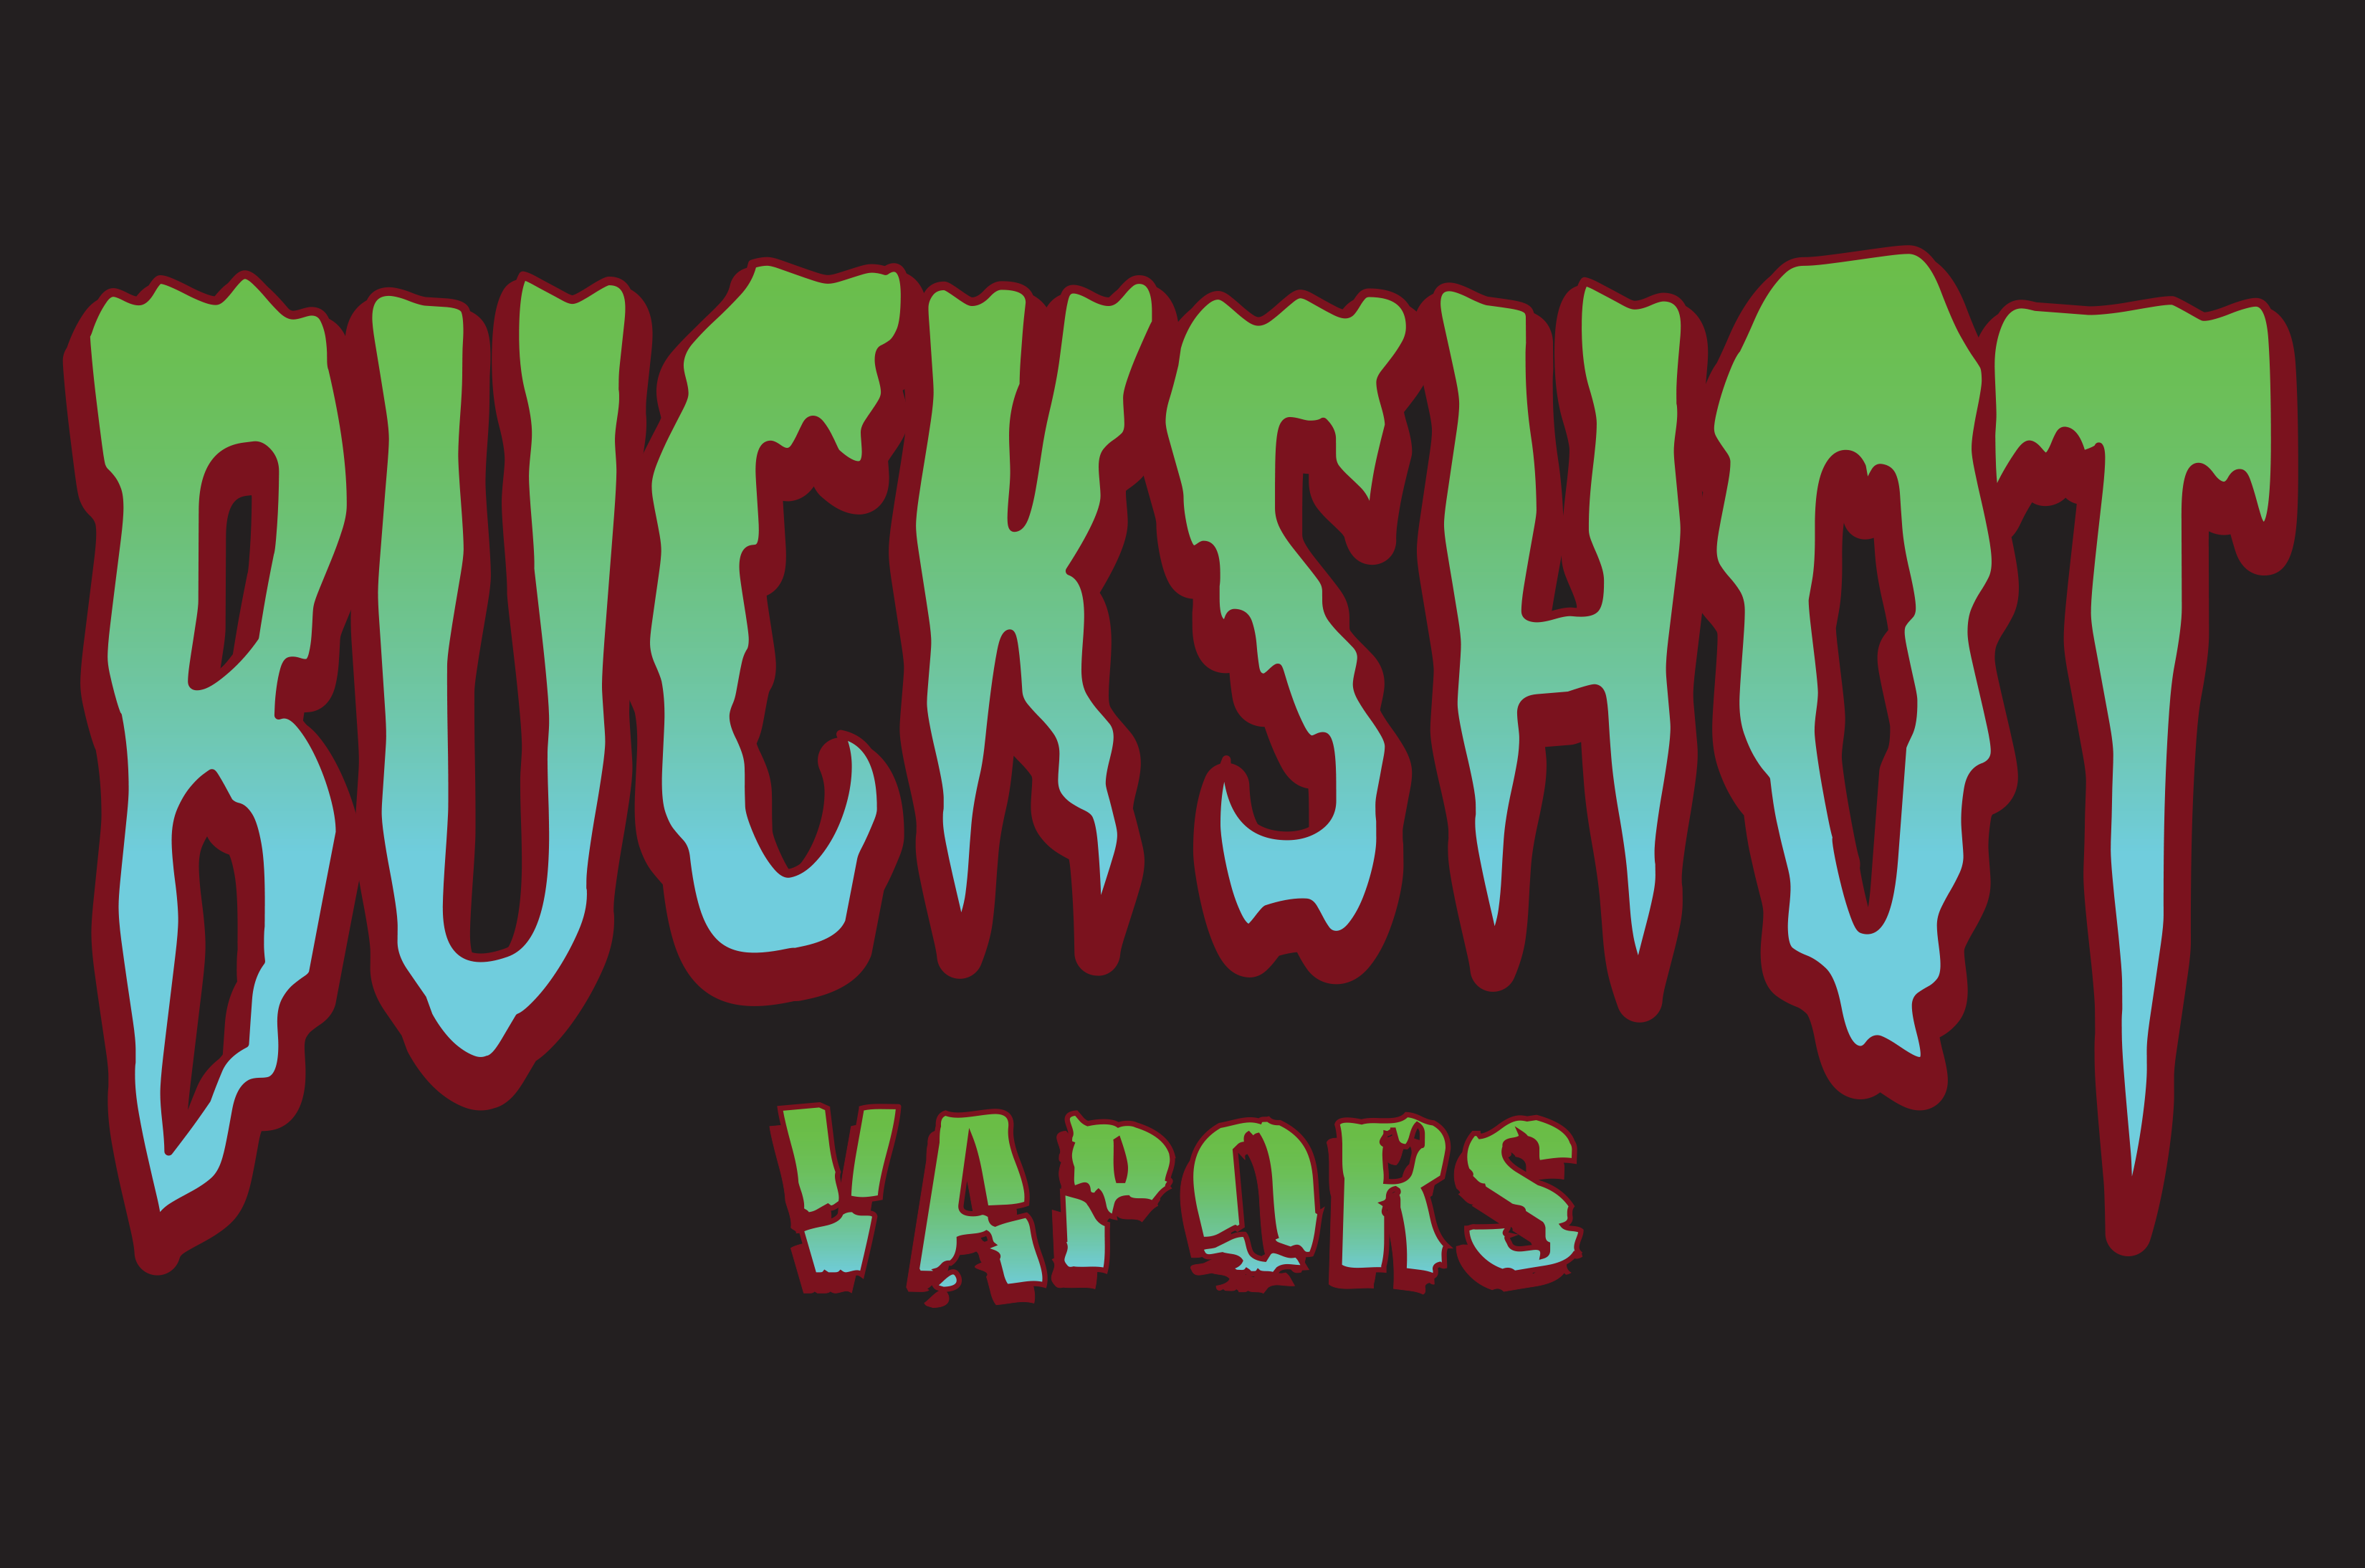 Buckshot Vapors